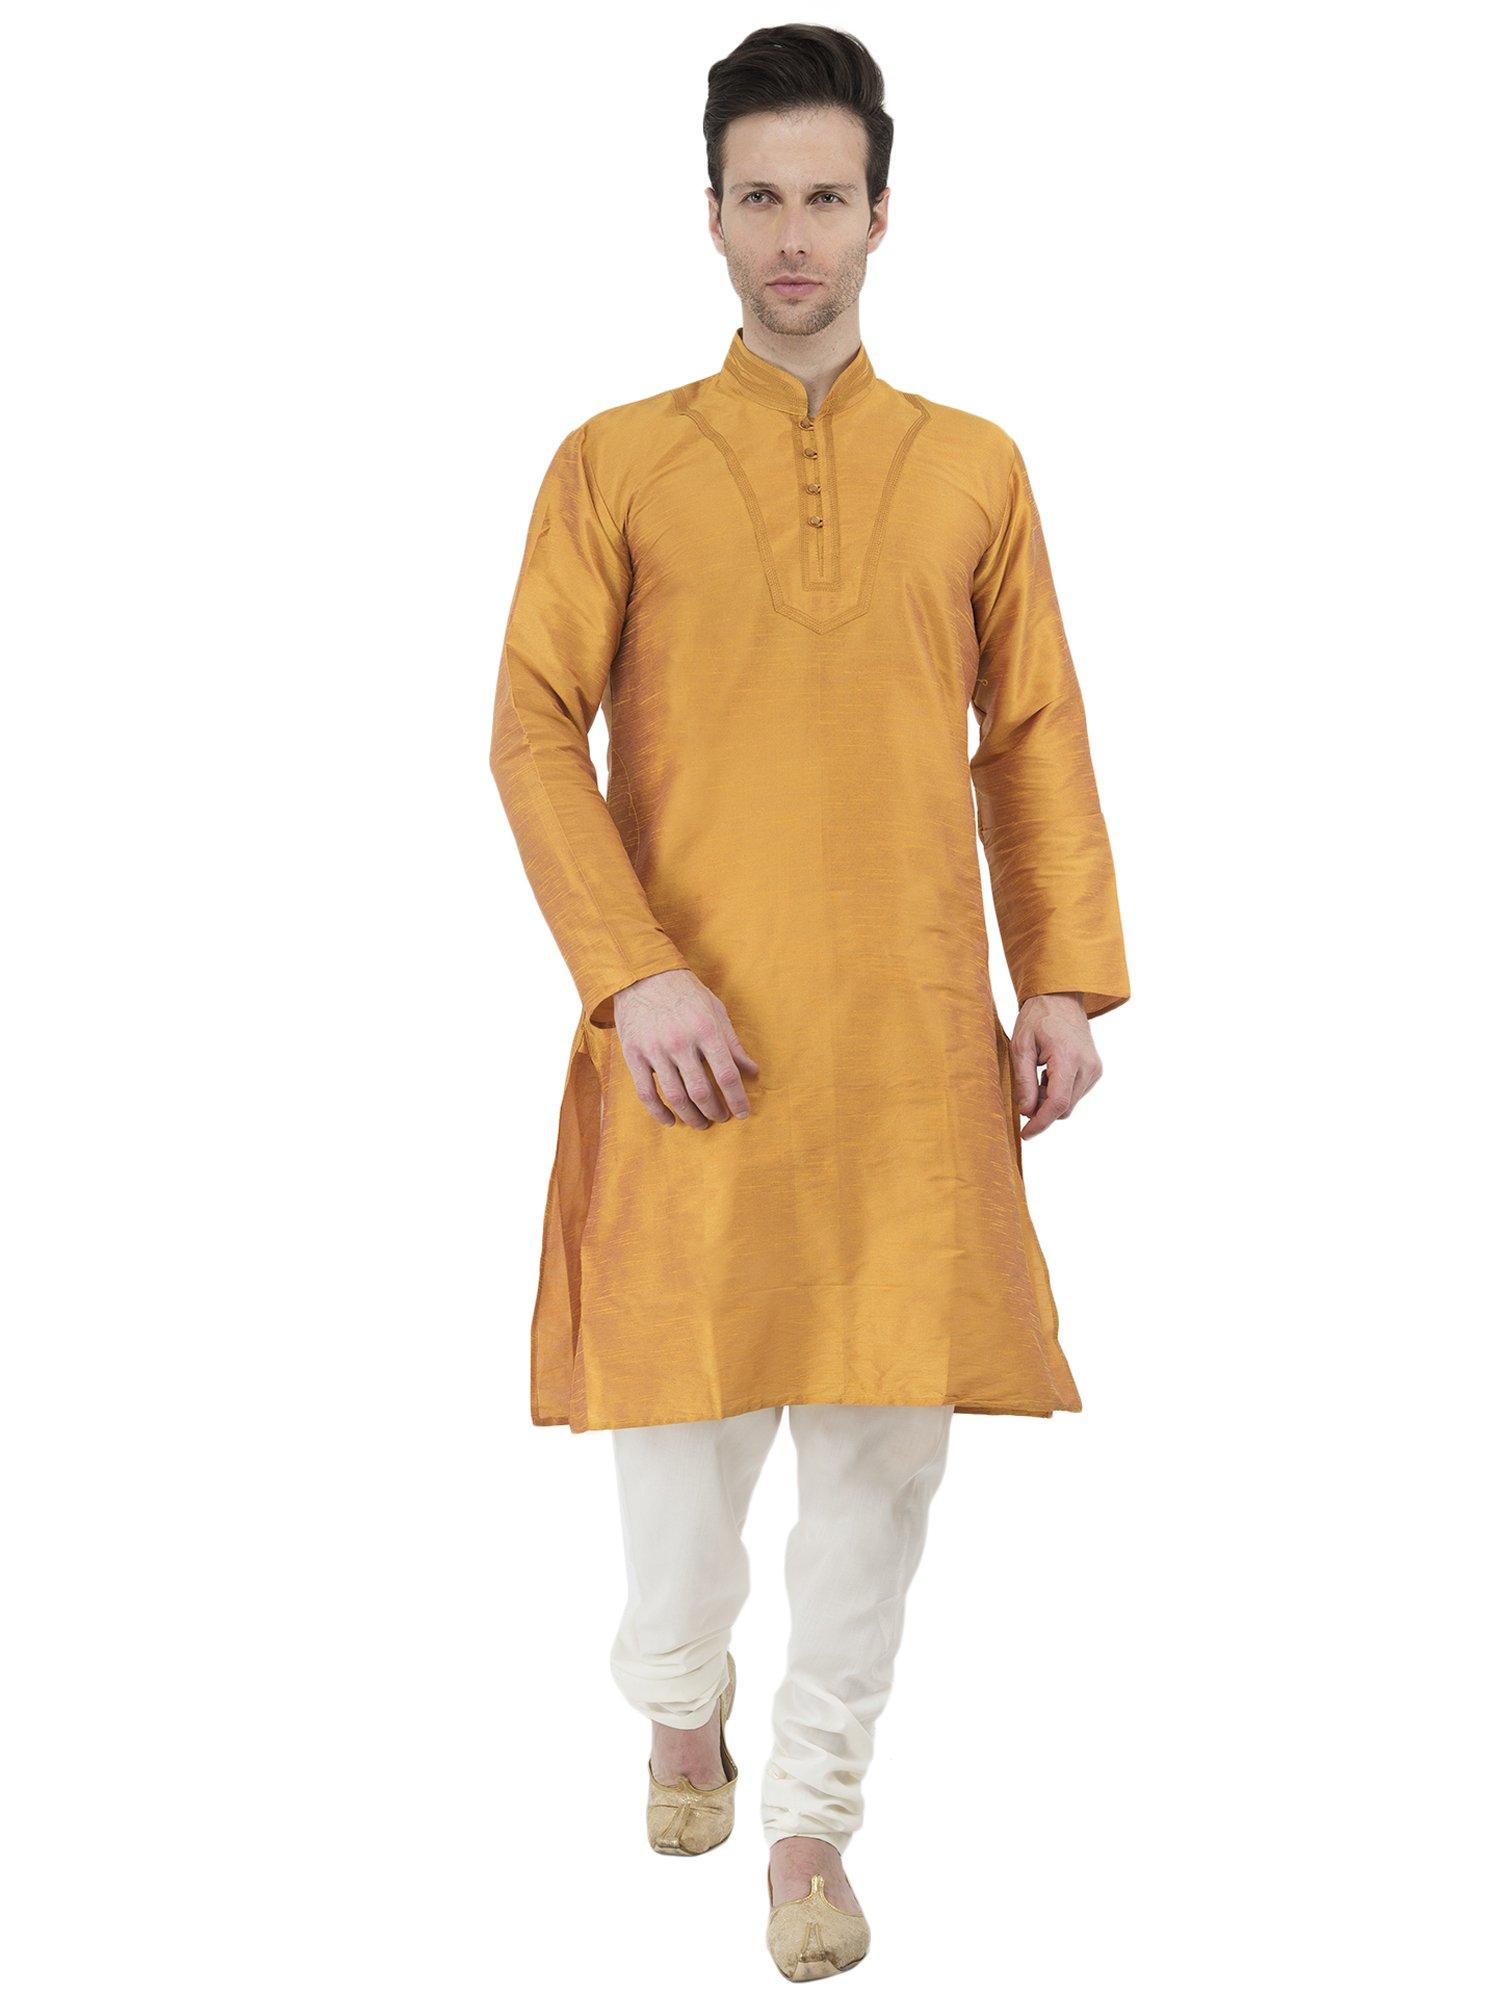 Mens Golden Kurta Pyjama Indian Style Wedding Bollywood Ethnic Long Sleeve Button Down Shirt Dress -M